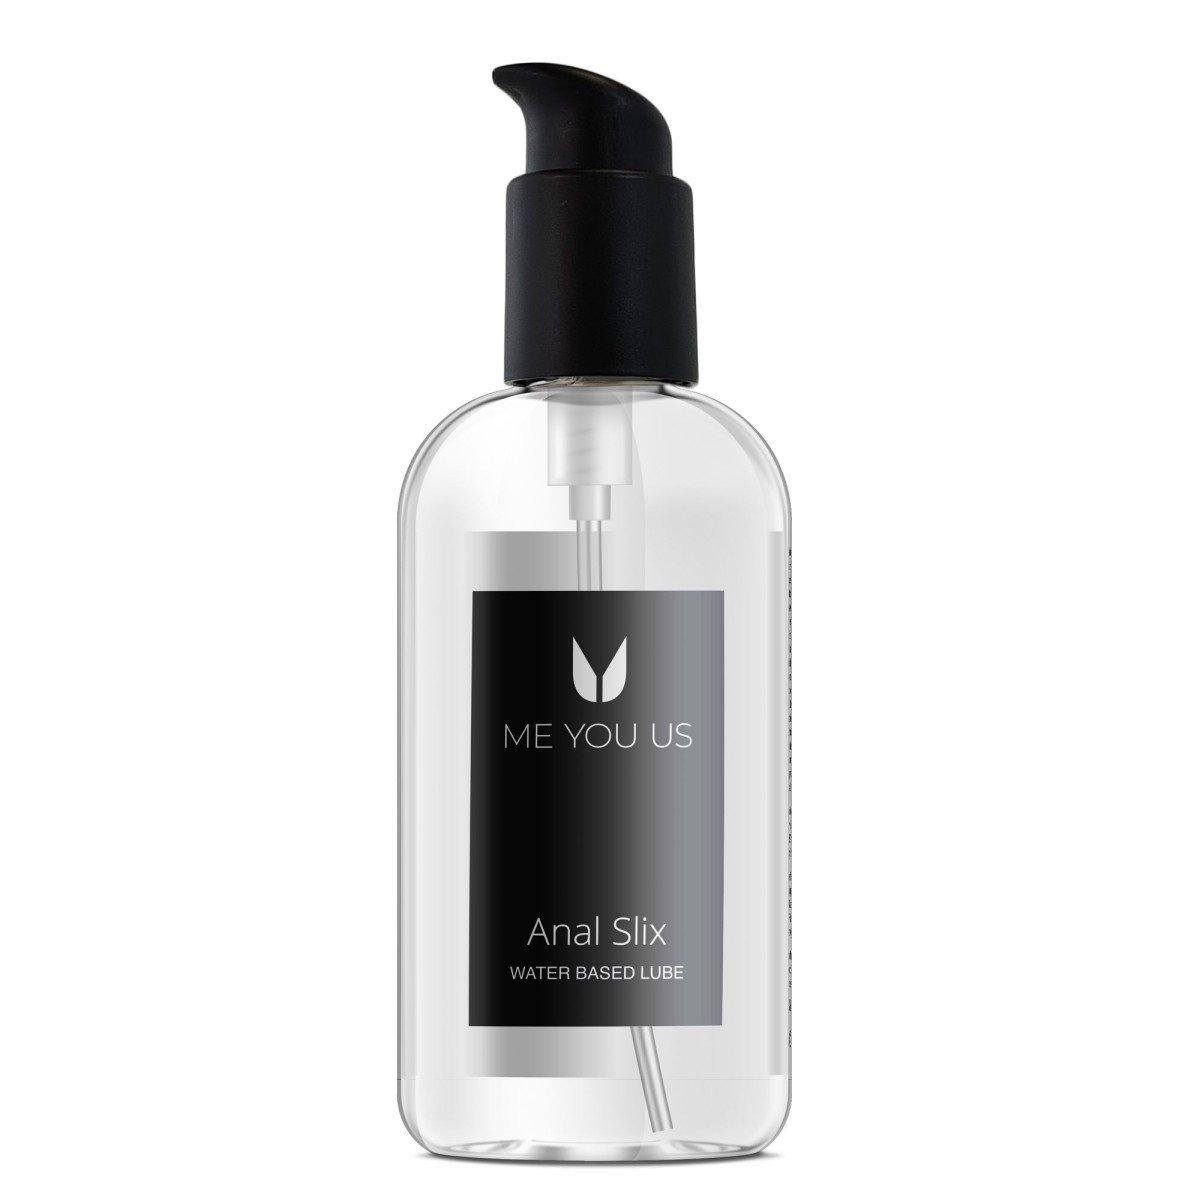 Anal Slix Lube 250 ml